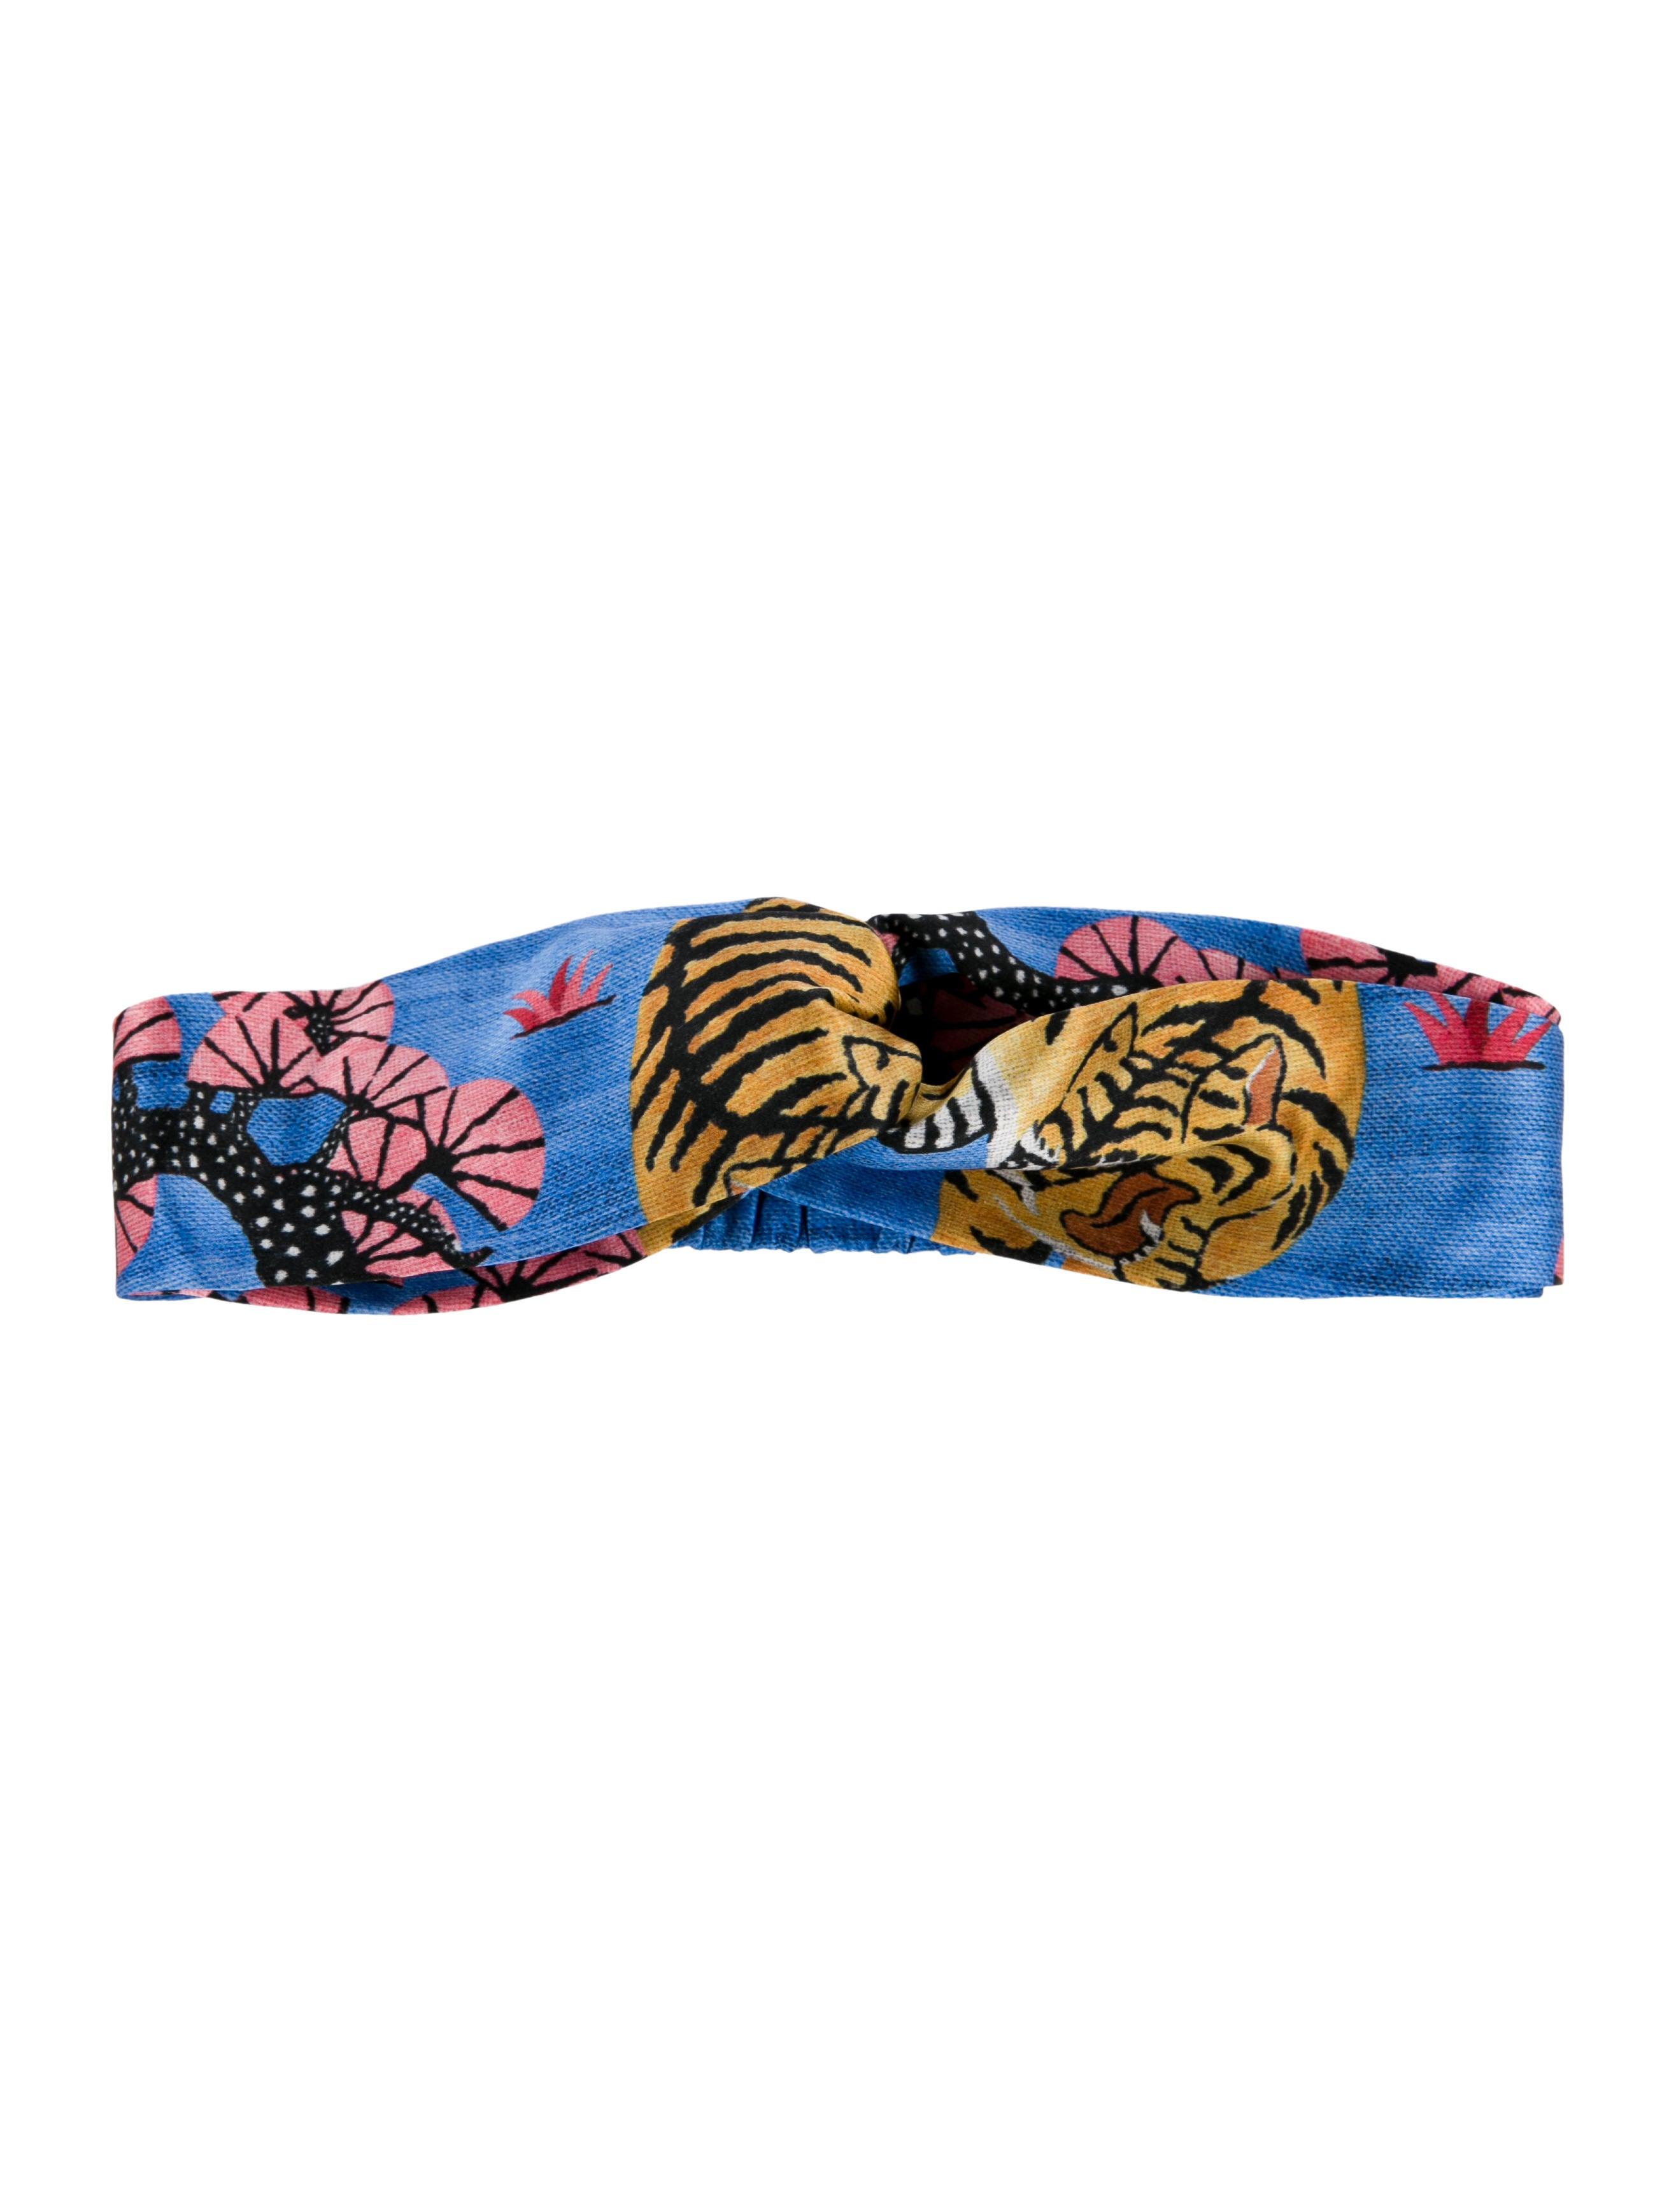 281030d2bcb Gucci Bengal Tiger Silk GG Headband - Accessories - GUC266443